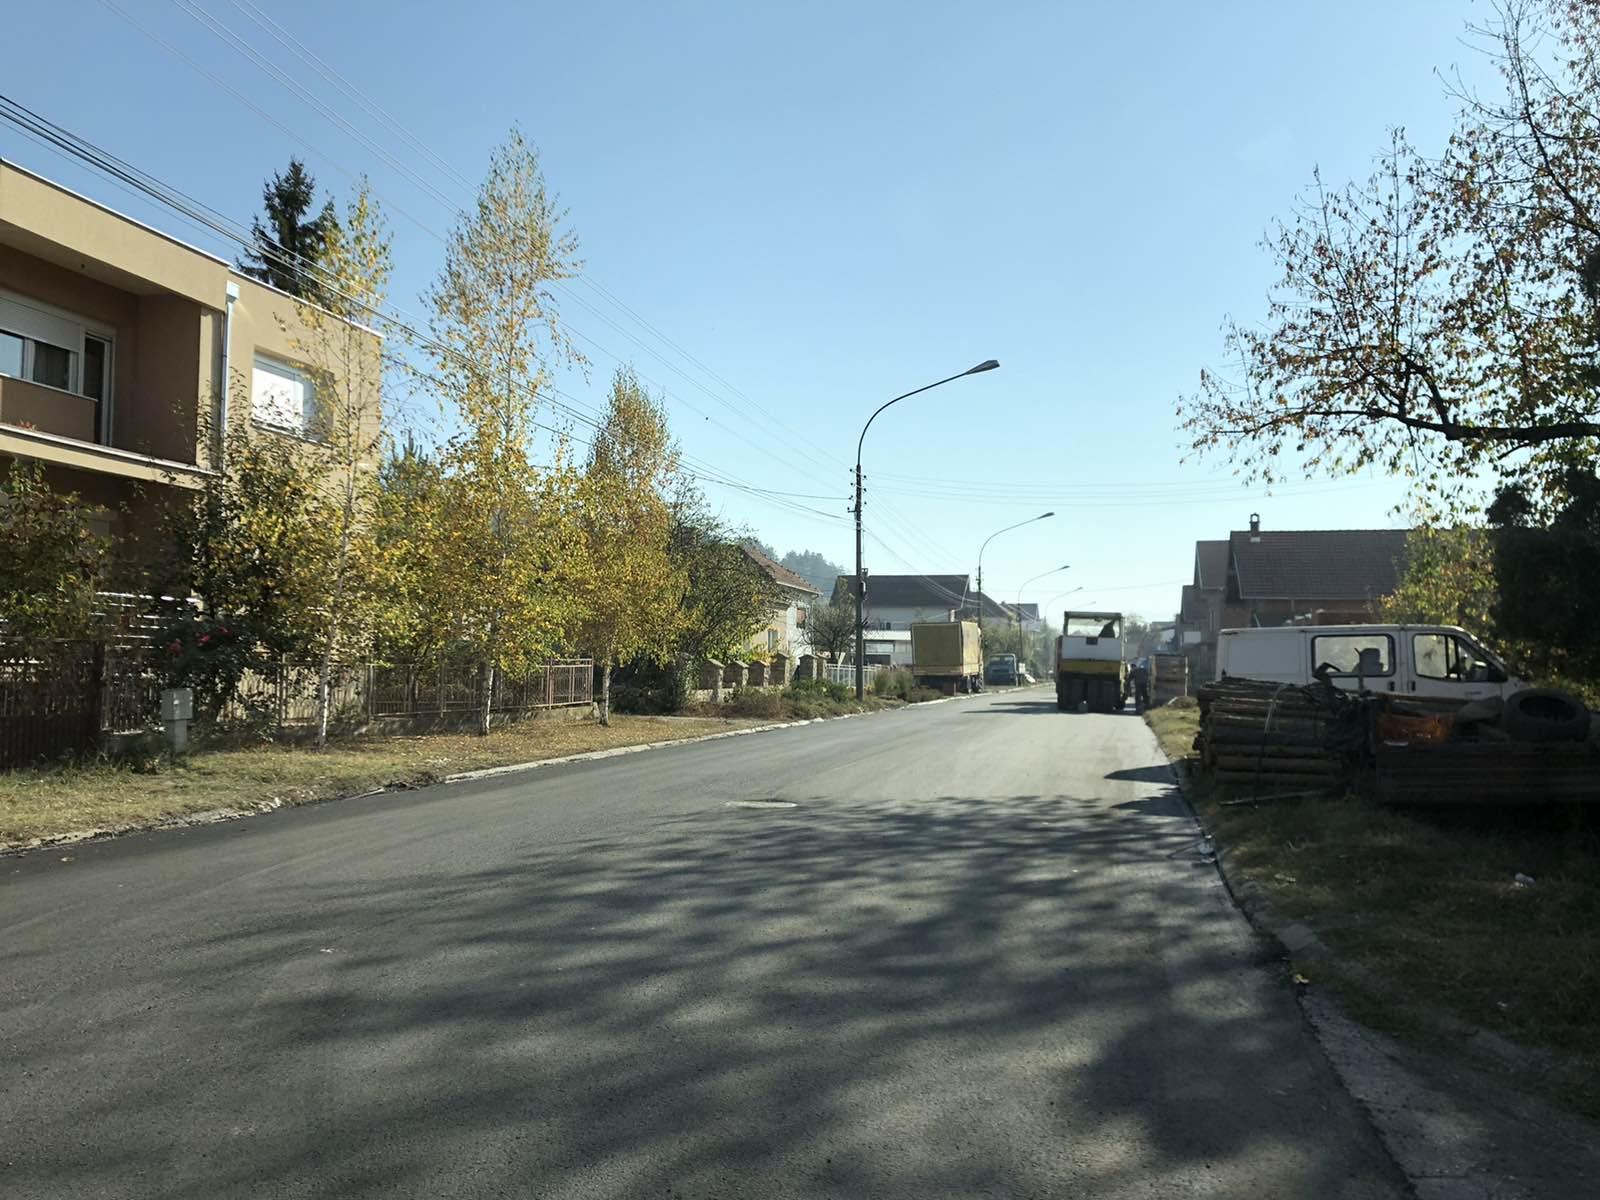 Asfaltiran deo ulice Stavre Partizana